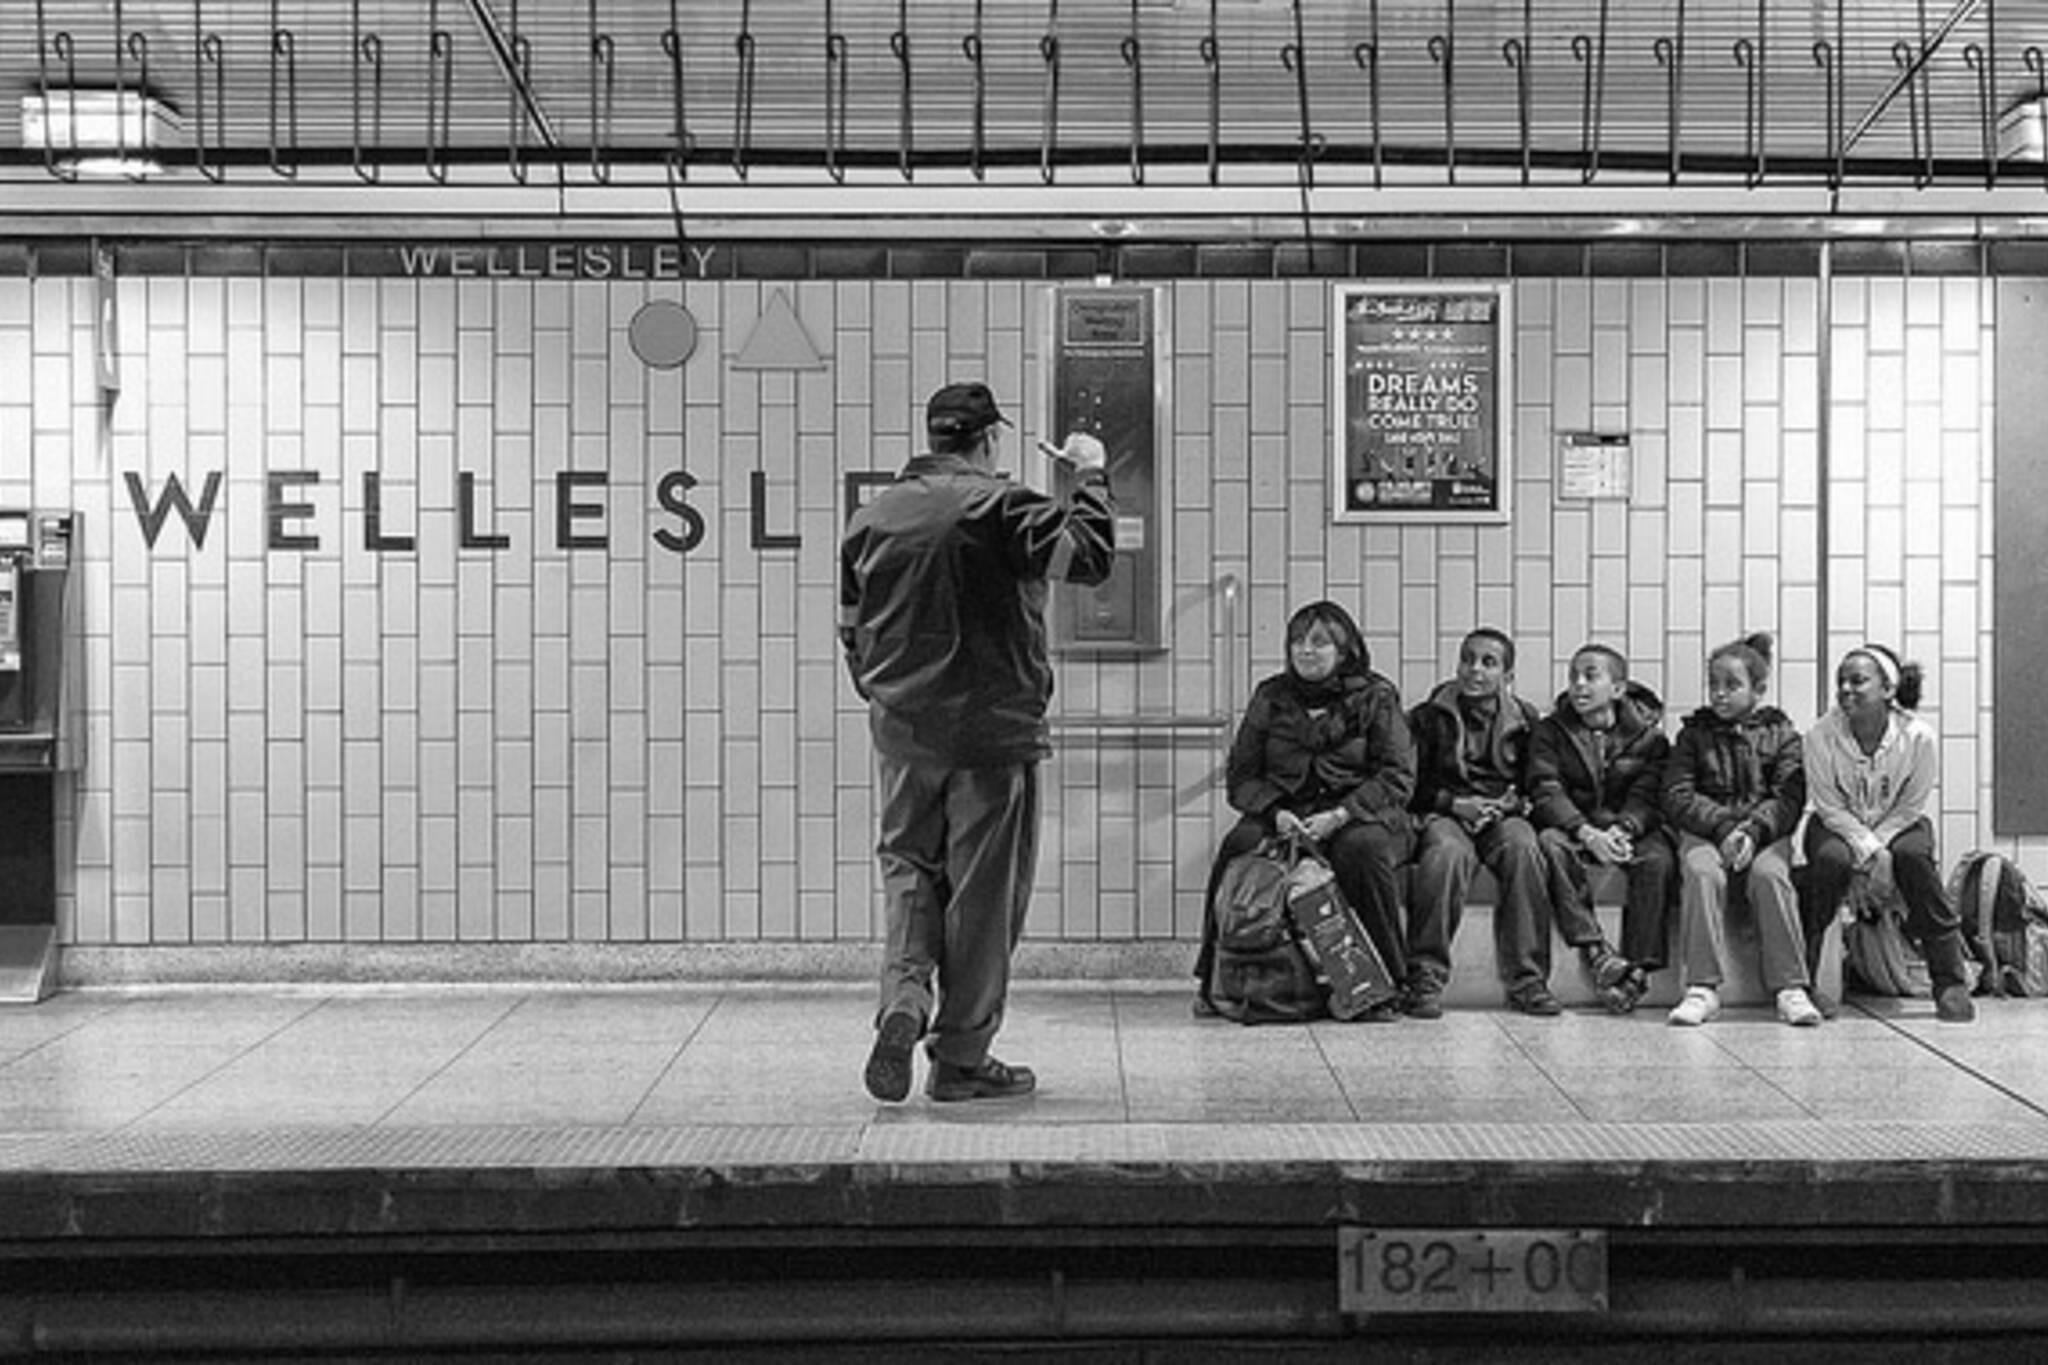 subway, wellesley, station